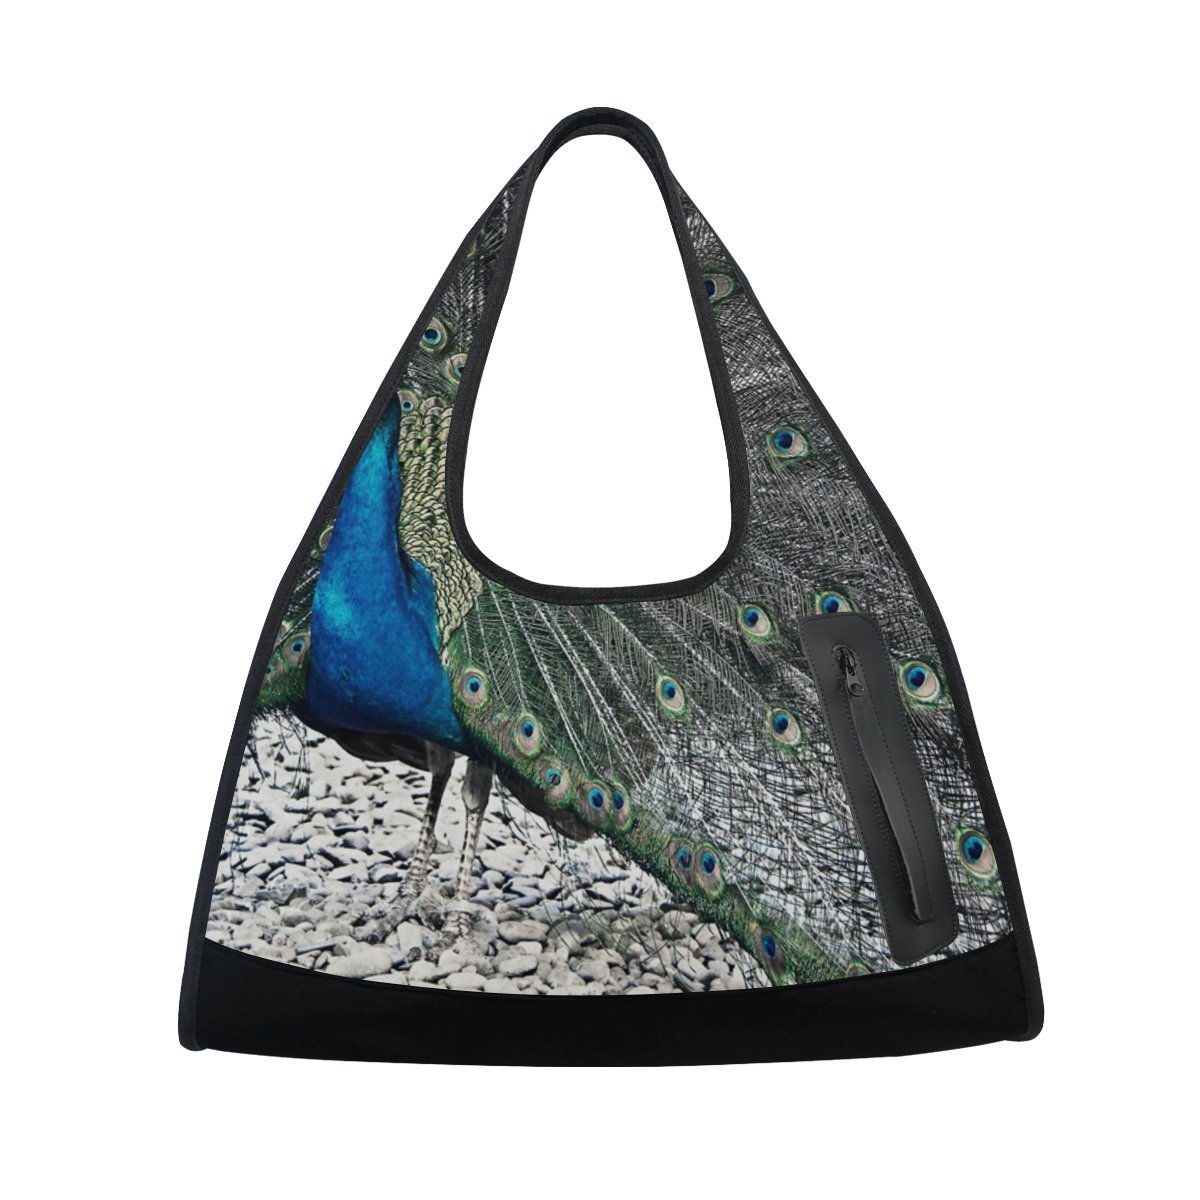 AHOMY Sports Gym Bag Peacock Duffel Bag Travel Shoulder Bag